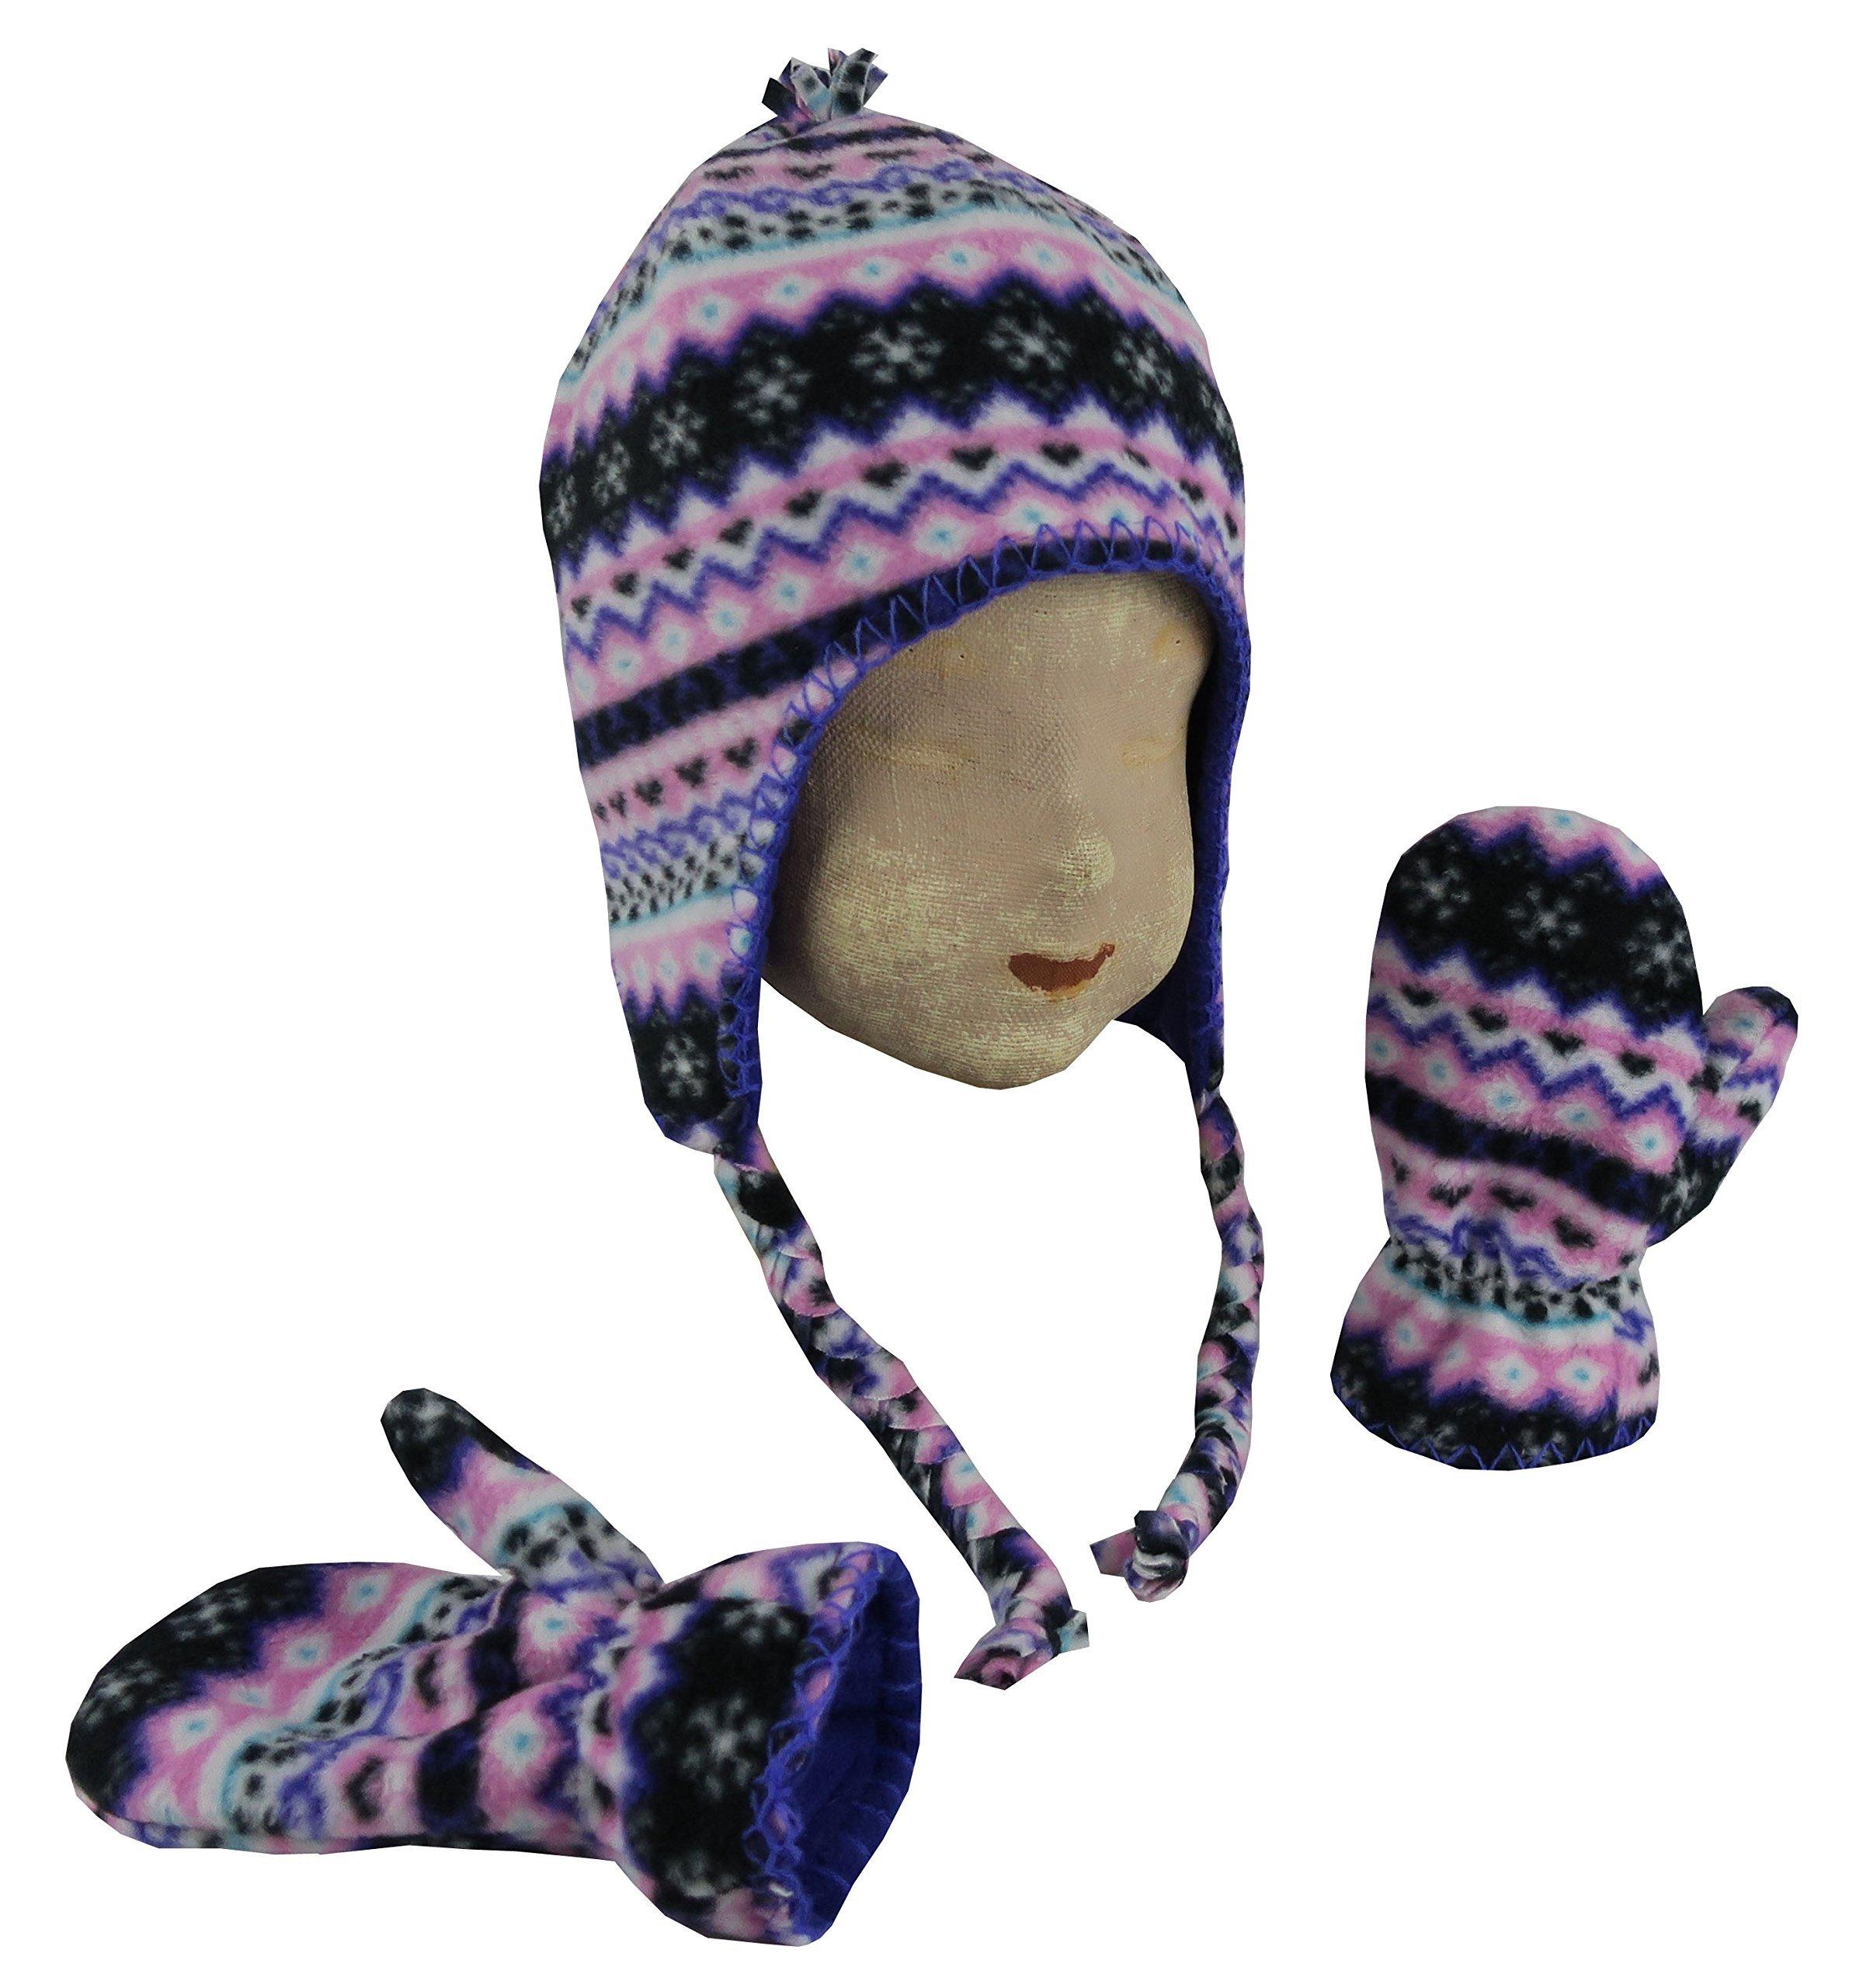 N'Ice Caps Little Kids and Baby Reversible Hat and Mittens Fleece Skater Set (2-3 Years, Neon Purple/Black Fairisle)